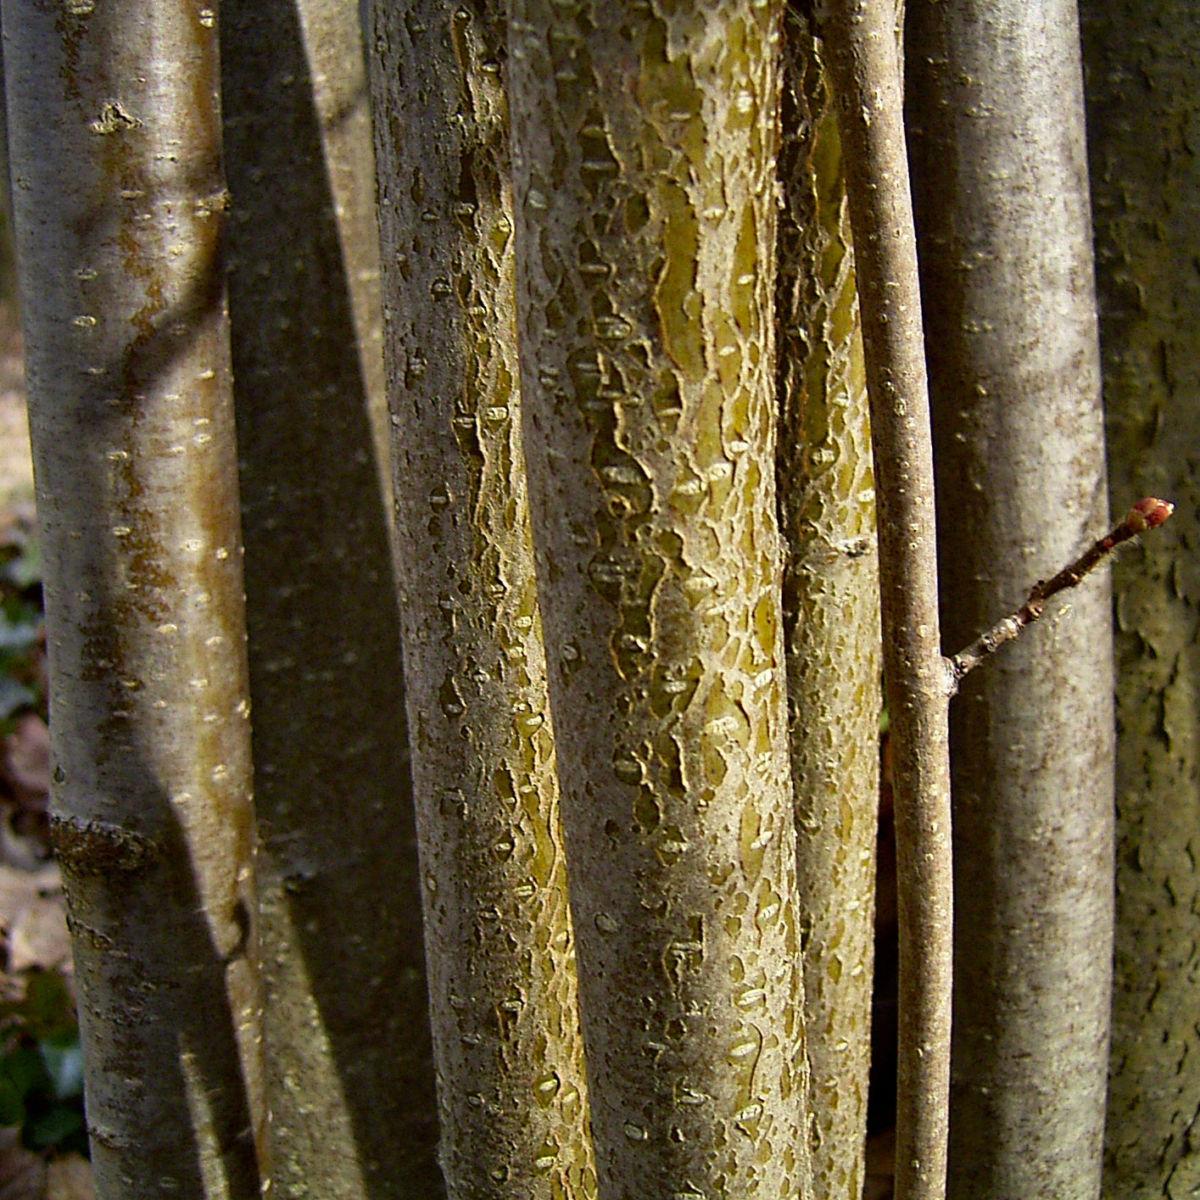 Haselnussstrauch Bluete Stamm Corylus avellana